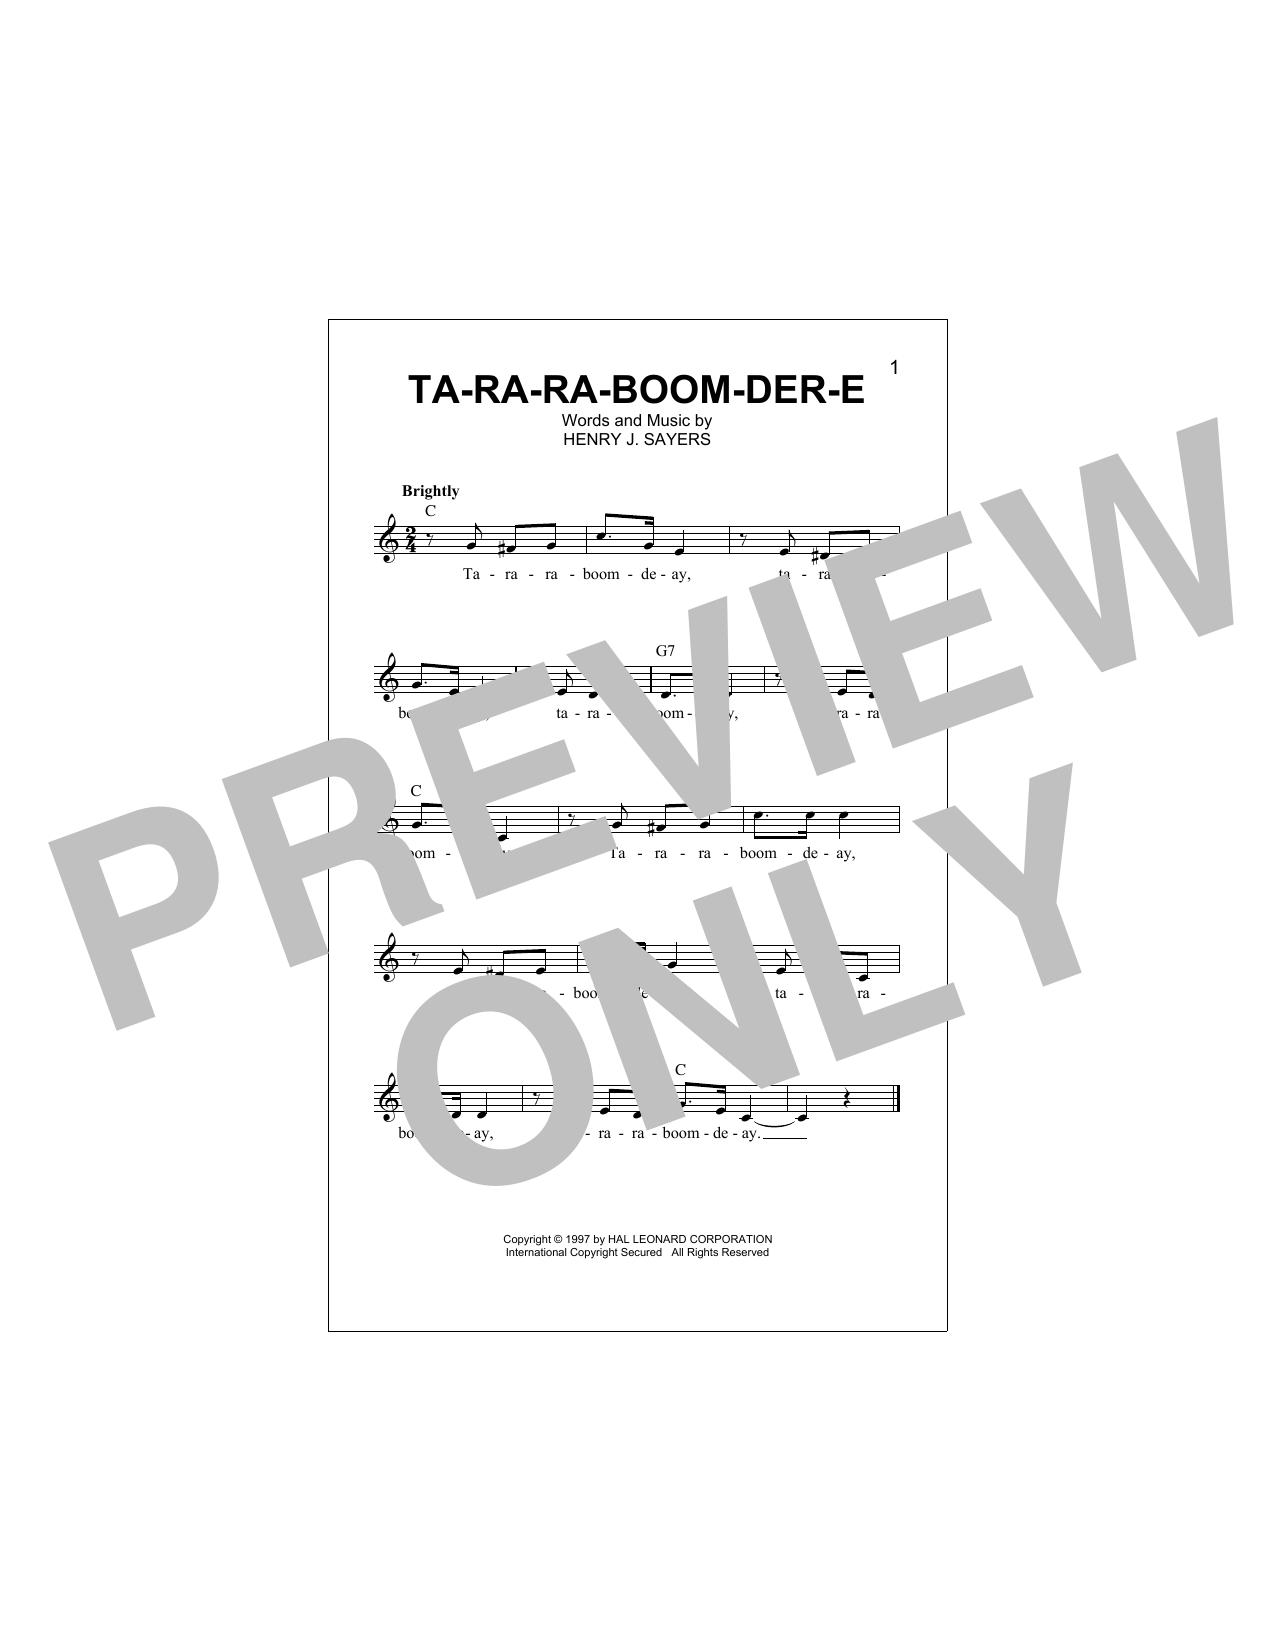 Henry J. Sayers Ta-Ra-Ra-Boom-Der-E sheet music notes and chords. Download Printable PDF.